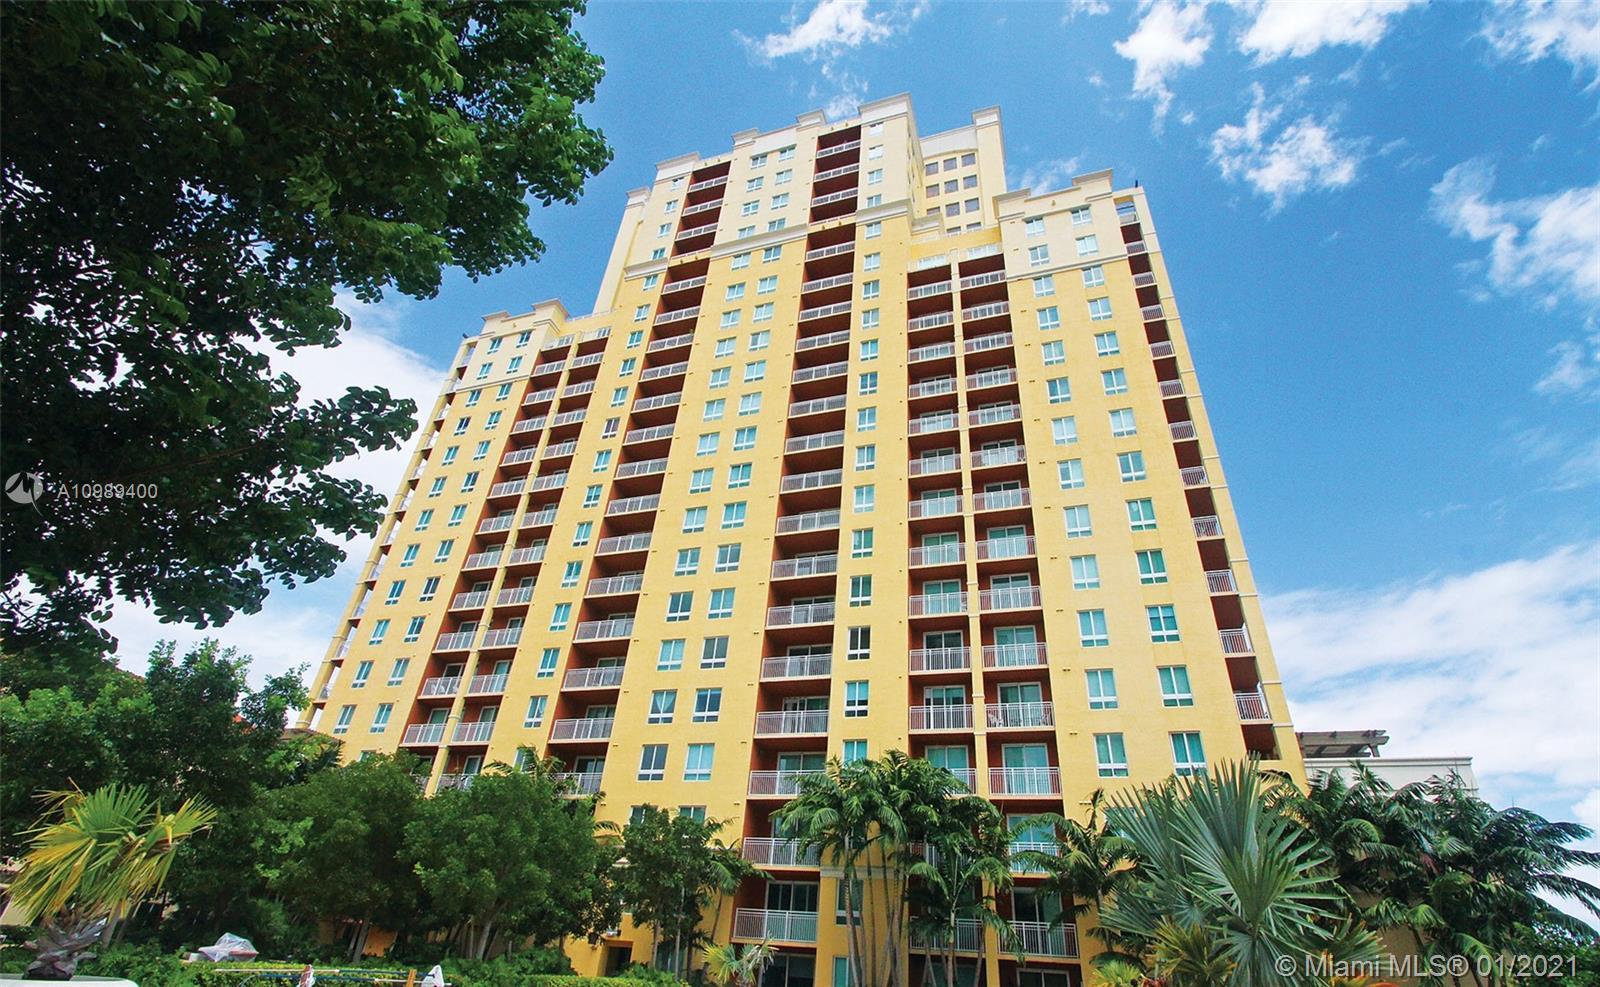 Toscano #1201S - 7350 SW 89th St #1201S, Miami, FL 33156